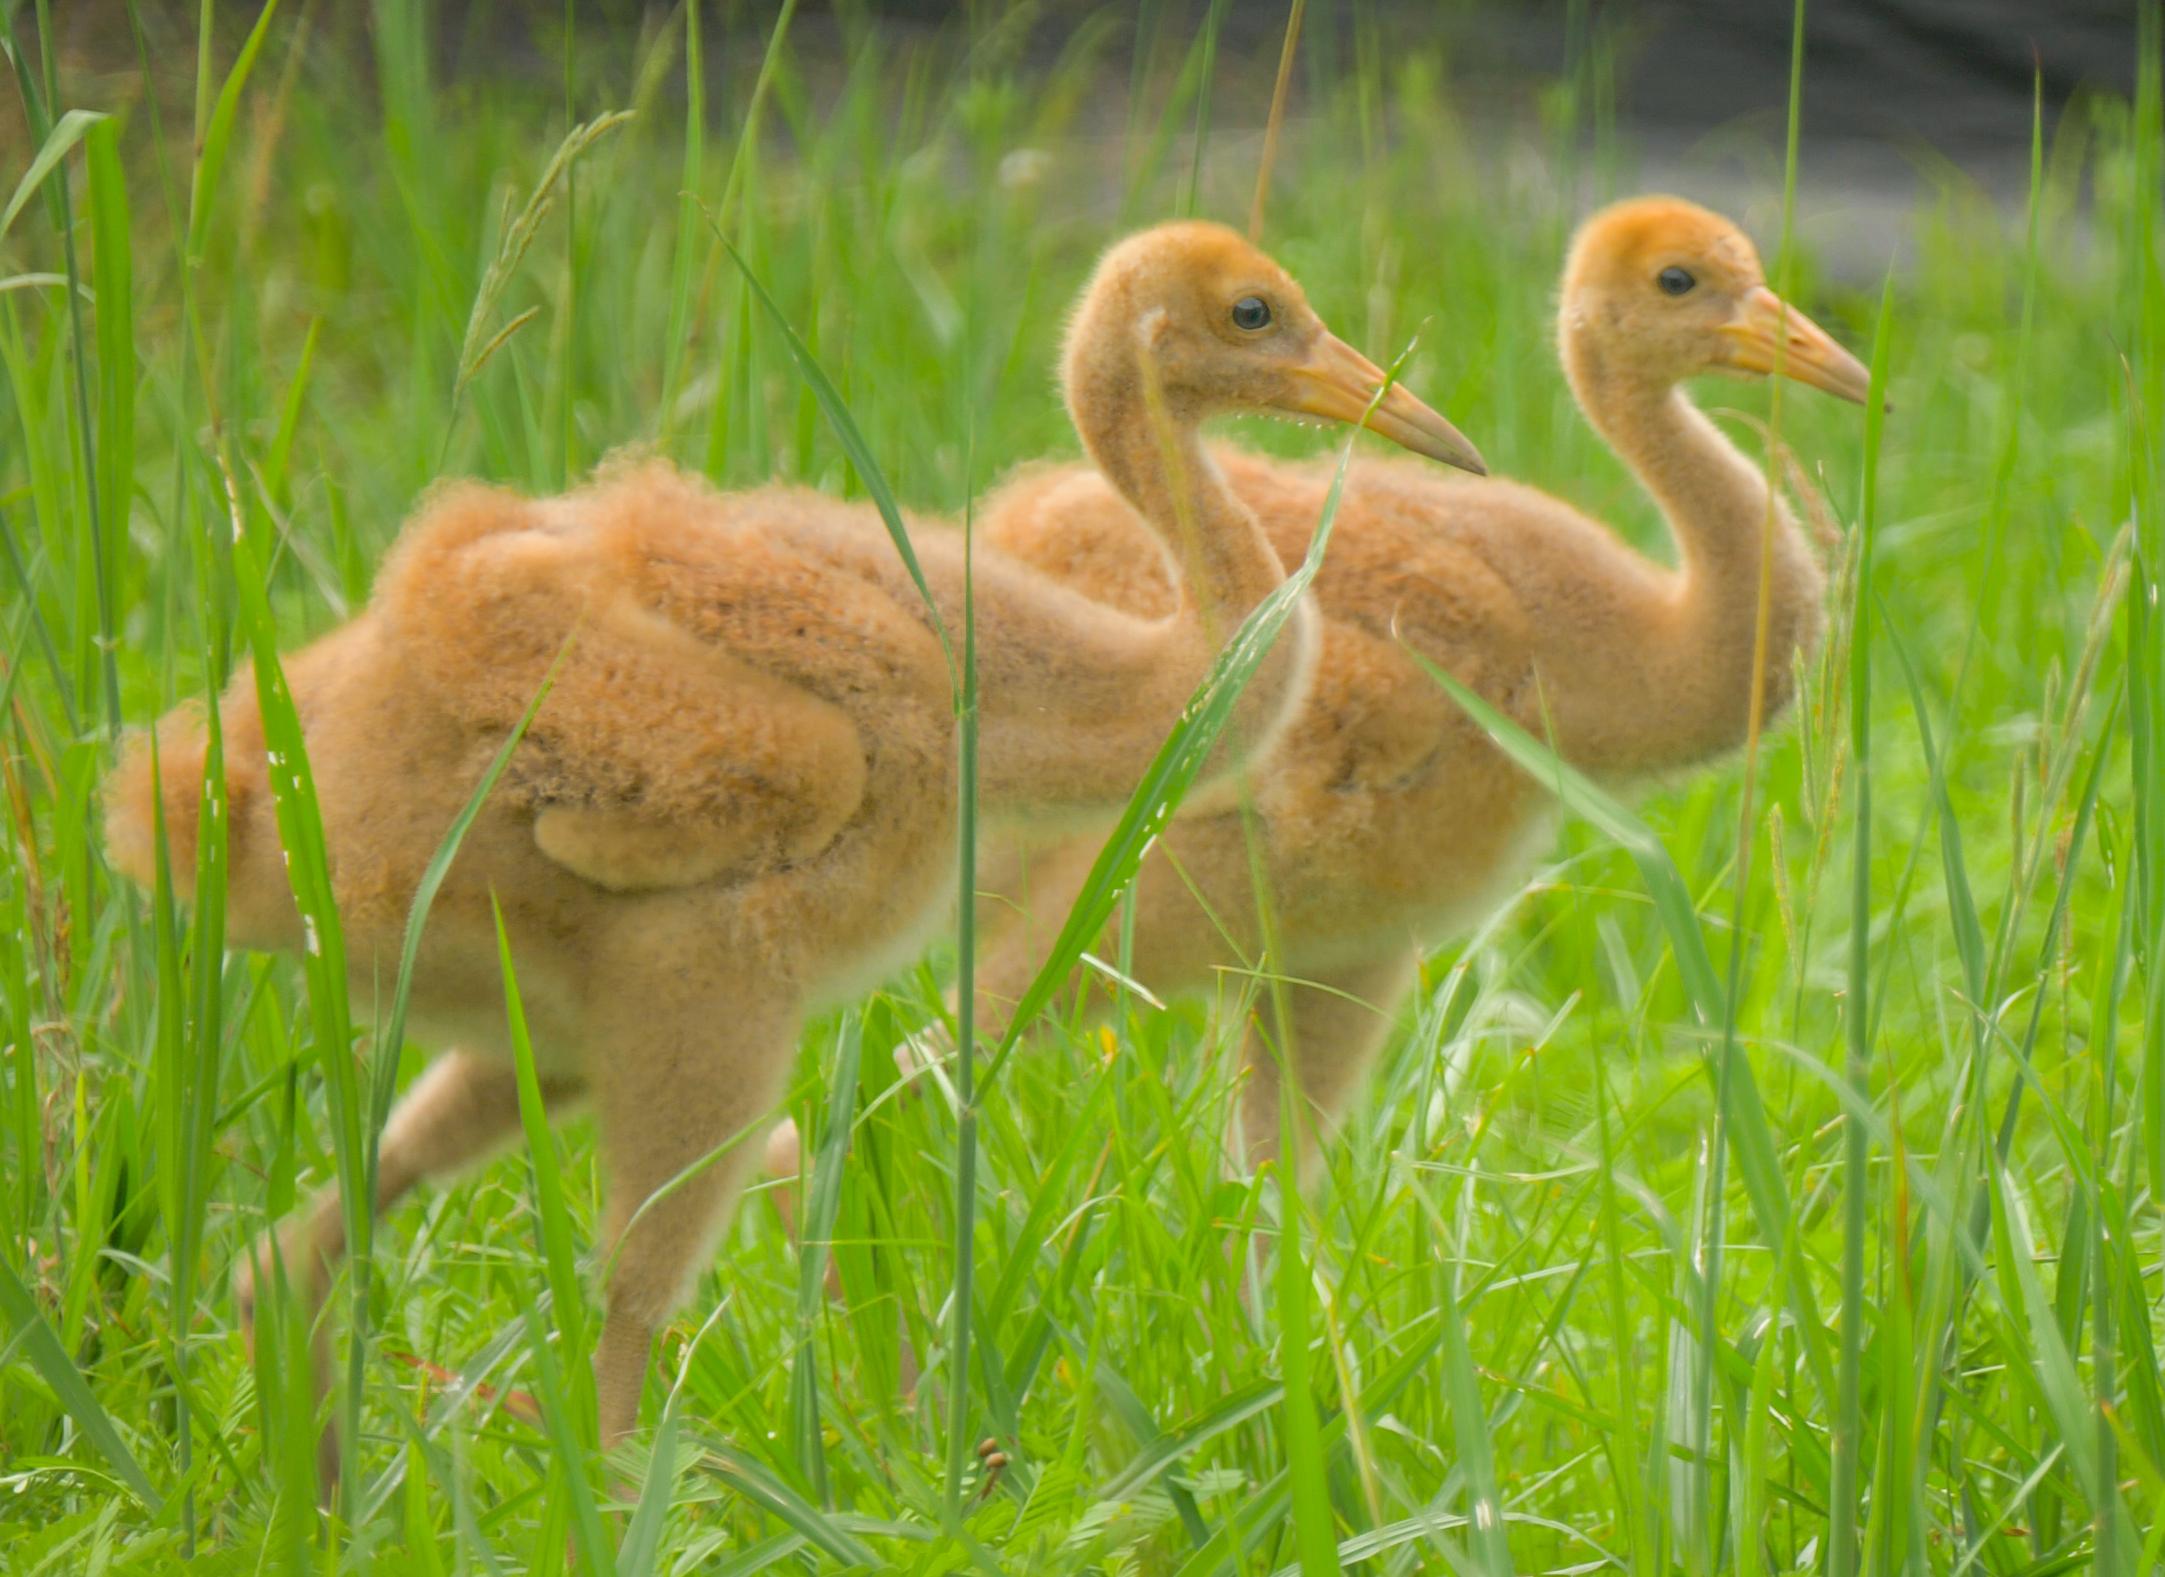 Endangered Whooping Cranes Make a Major Comeback at Freeport-McMoRan Audubon Species Survival Center